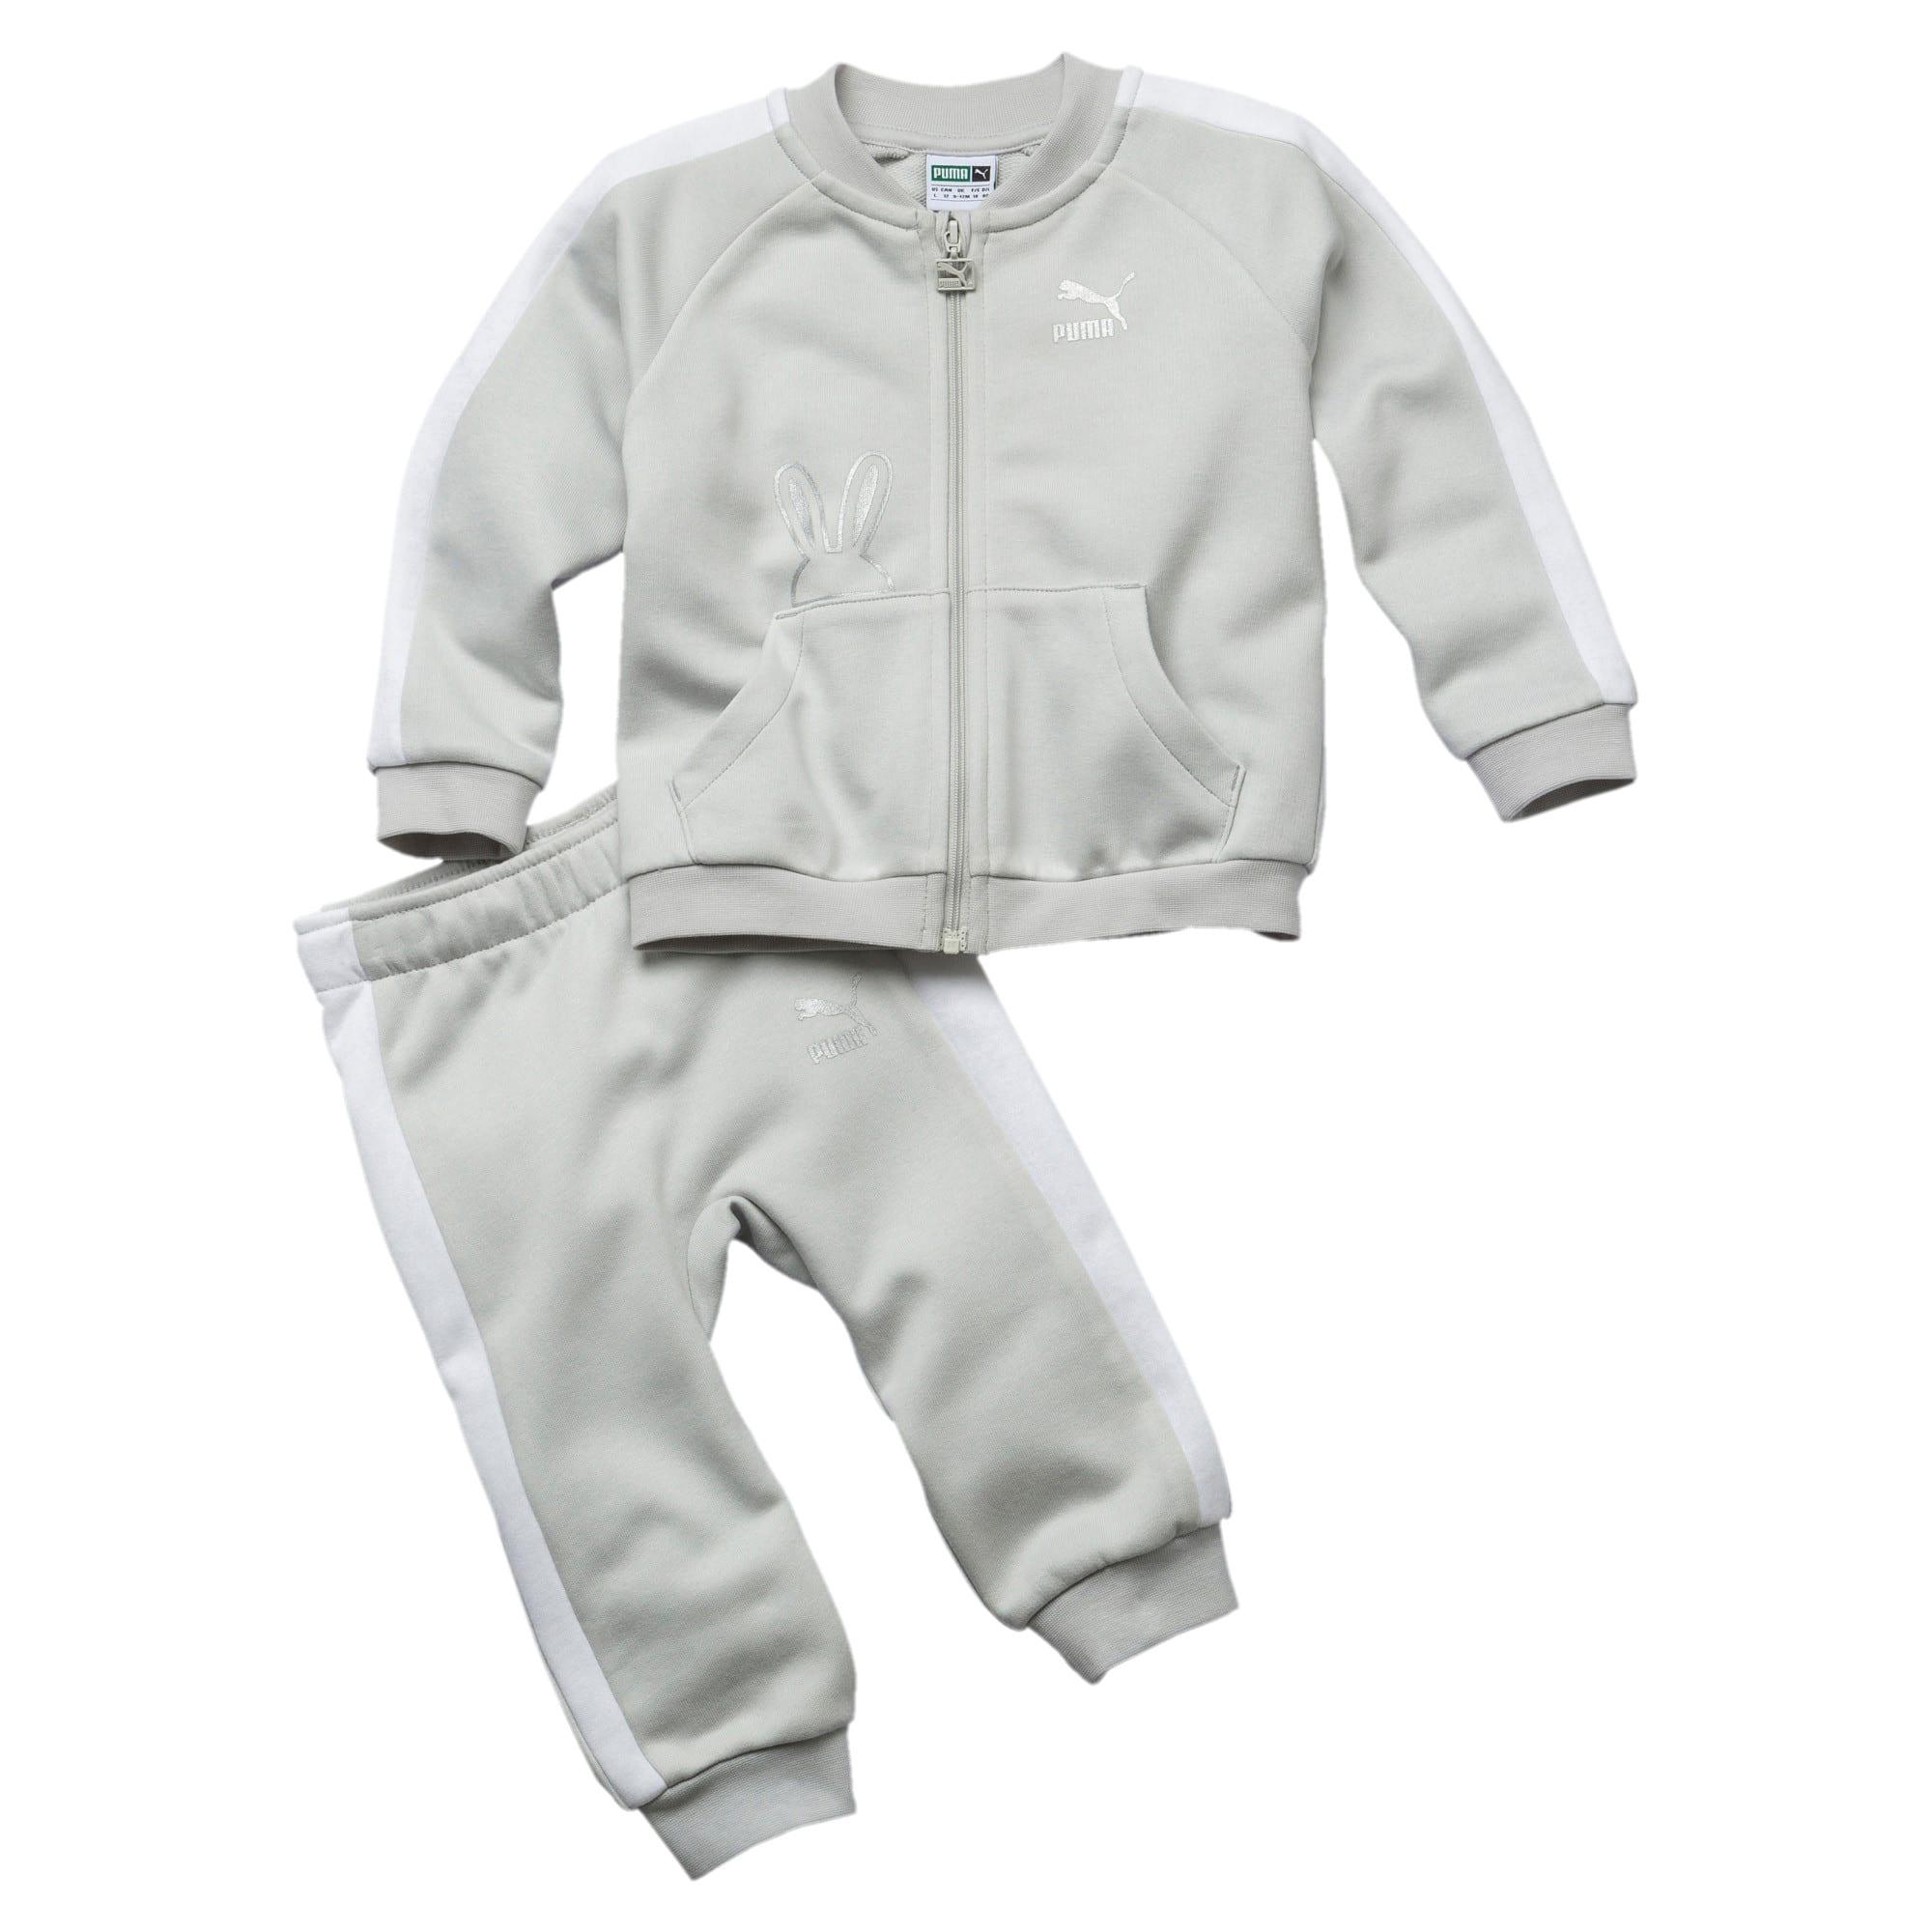 Thumbnail 1 of Infant + Toddler Easter Set, Glacier Gray, medium